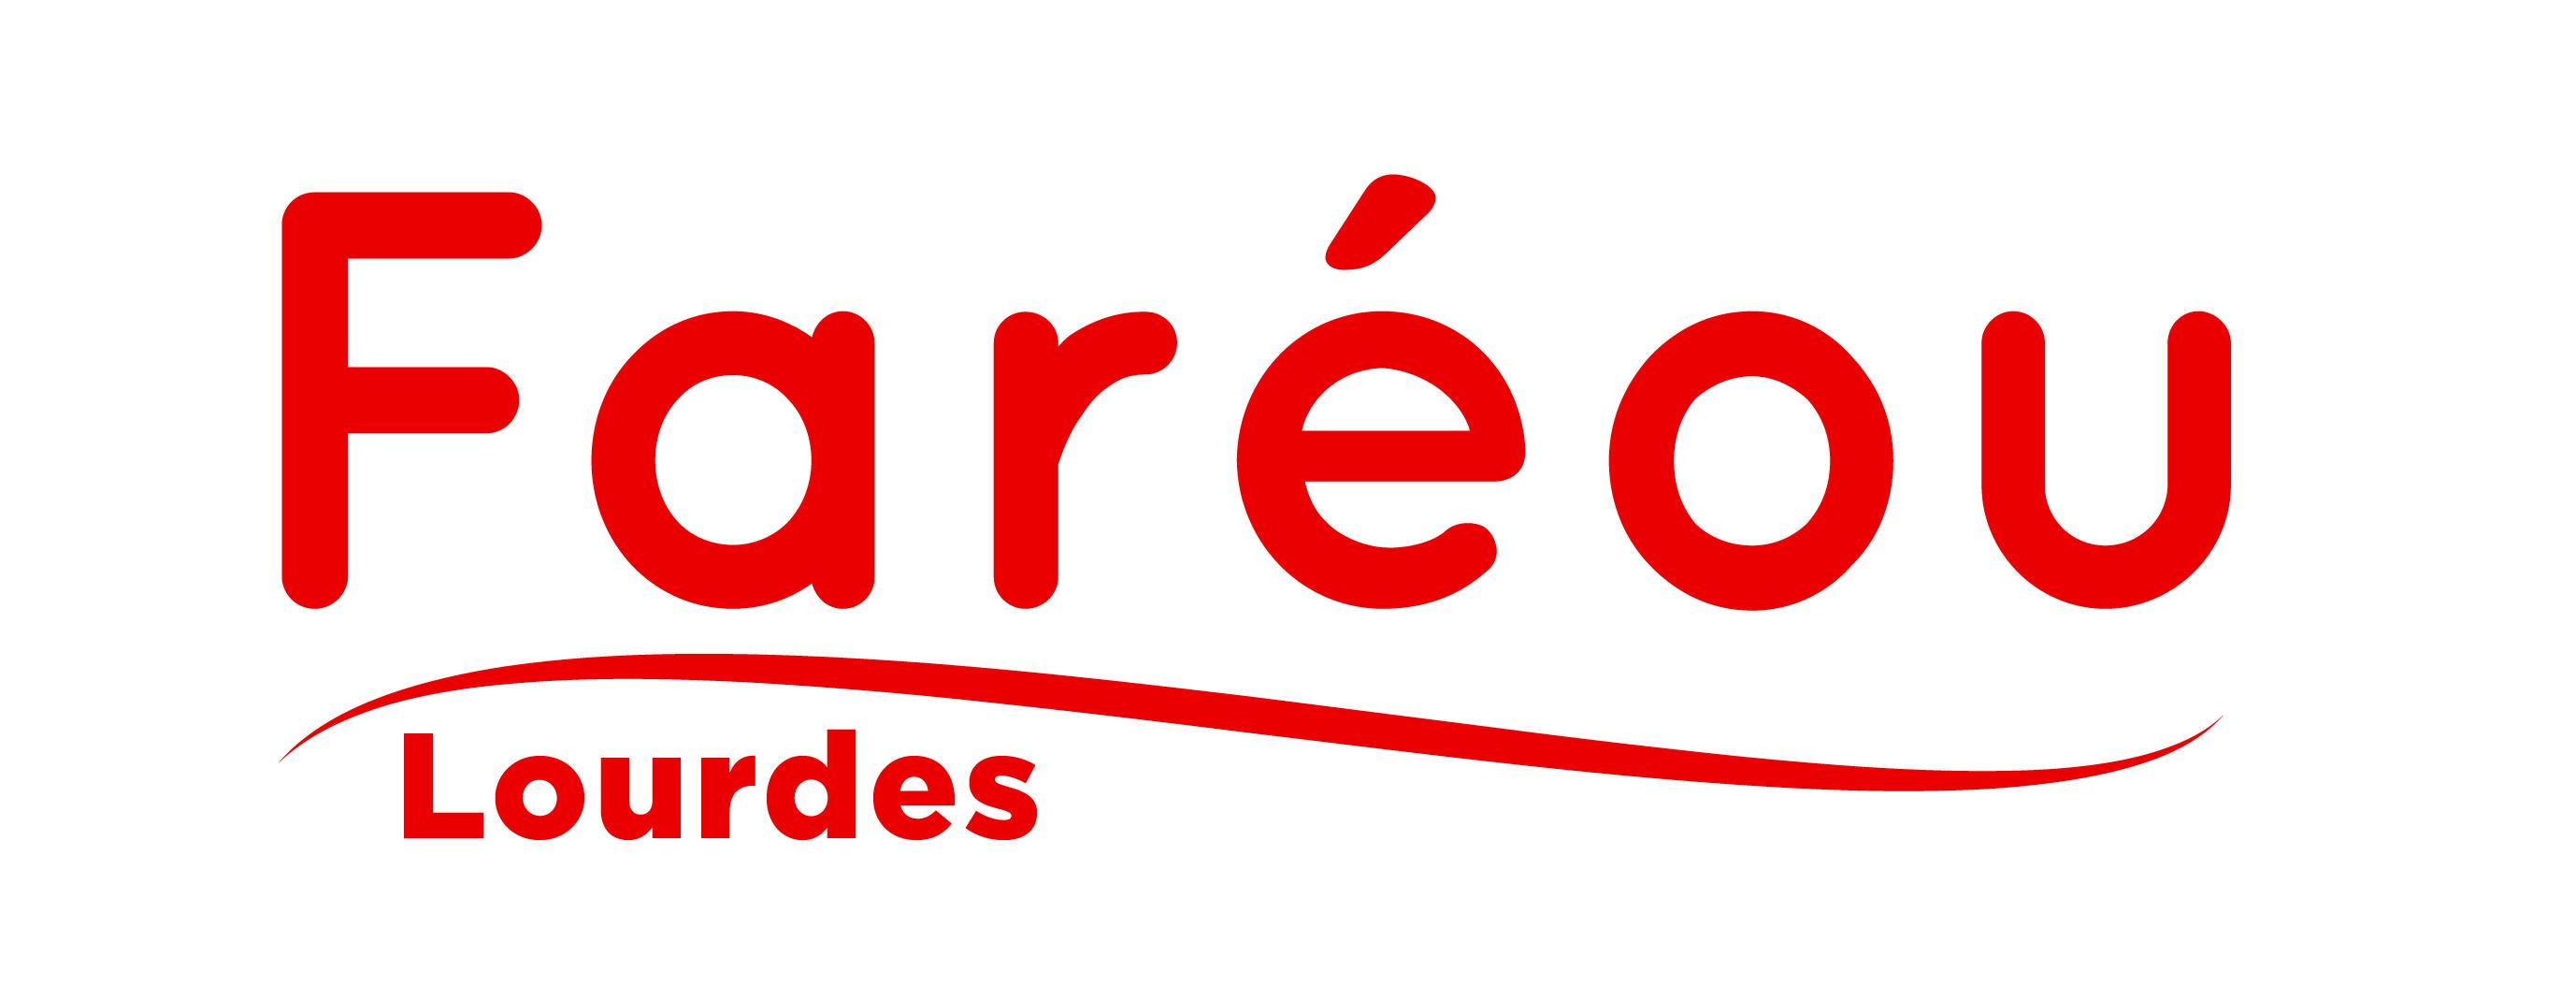 FAREOU-Lourdes-01